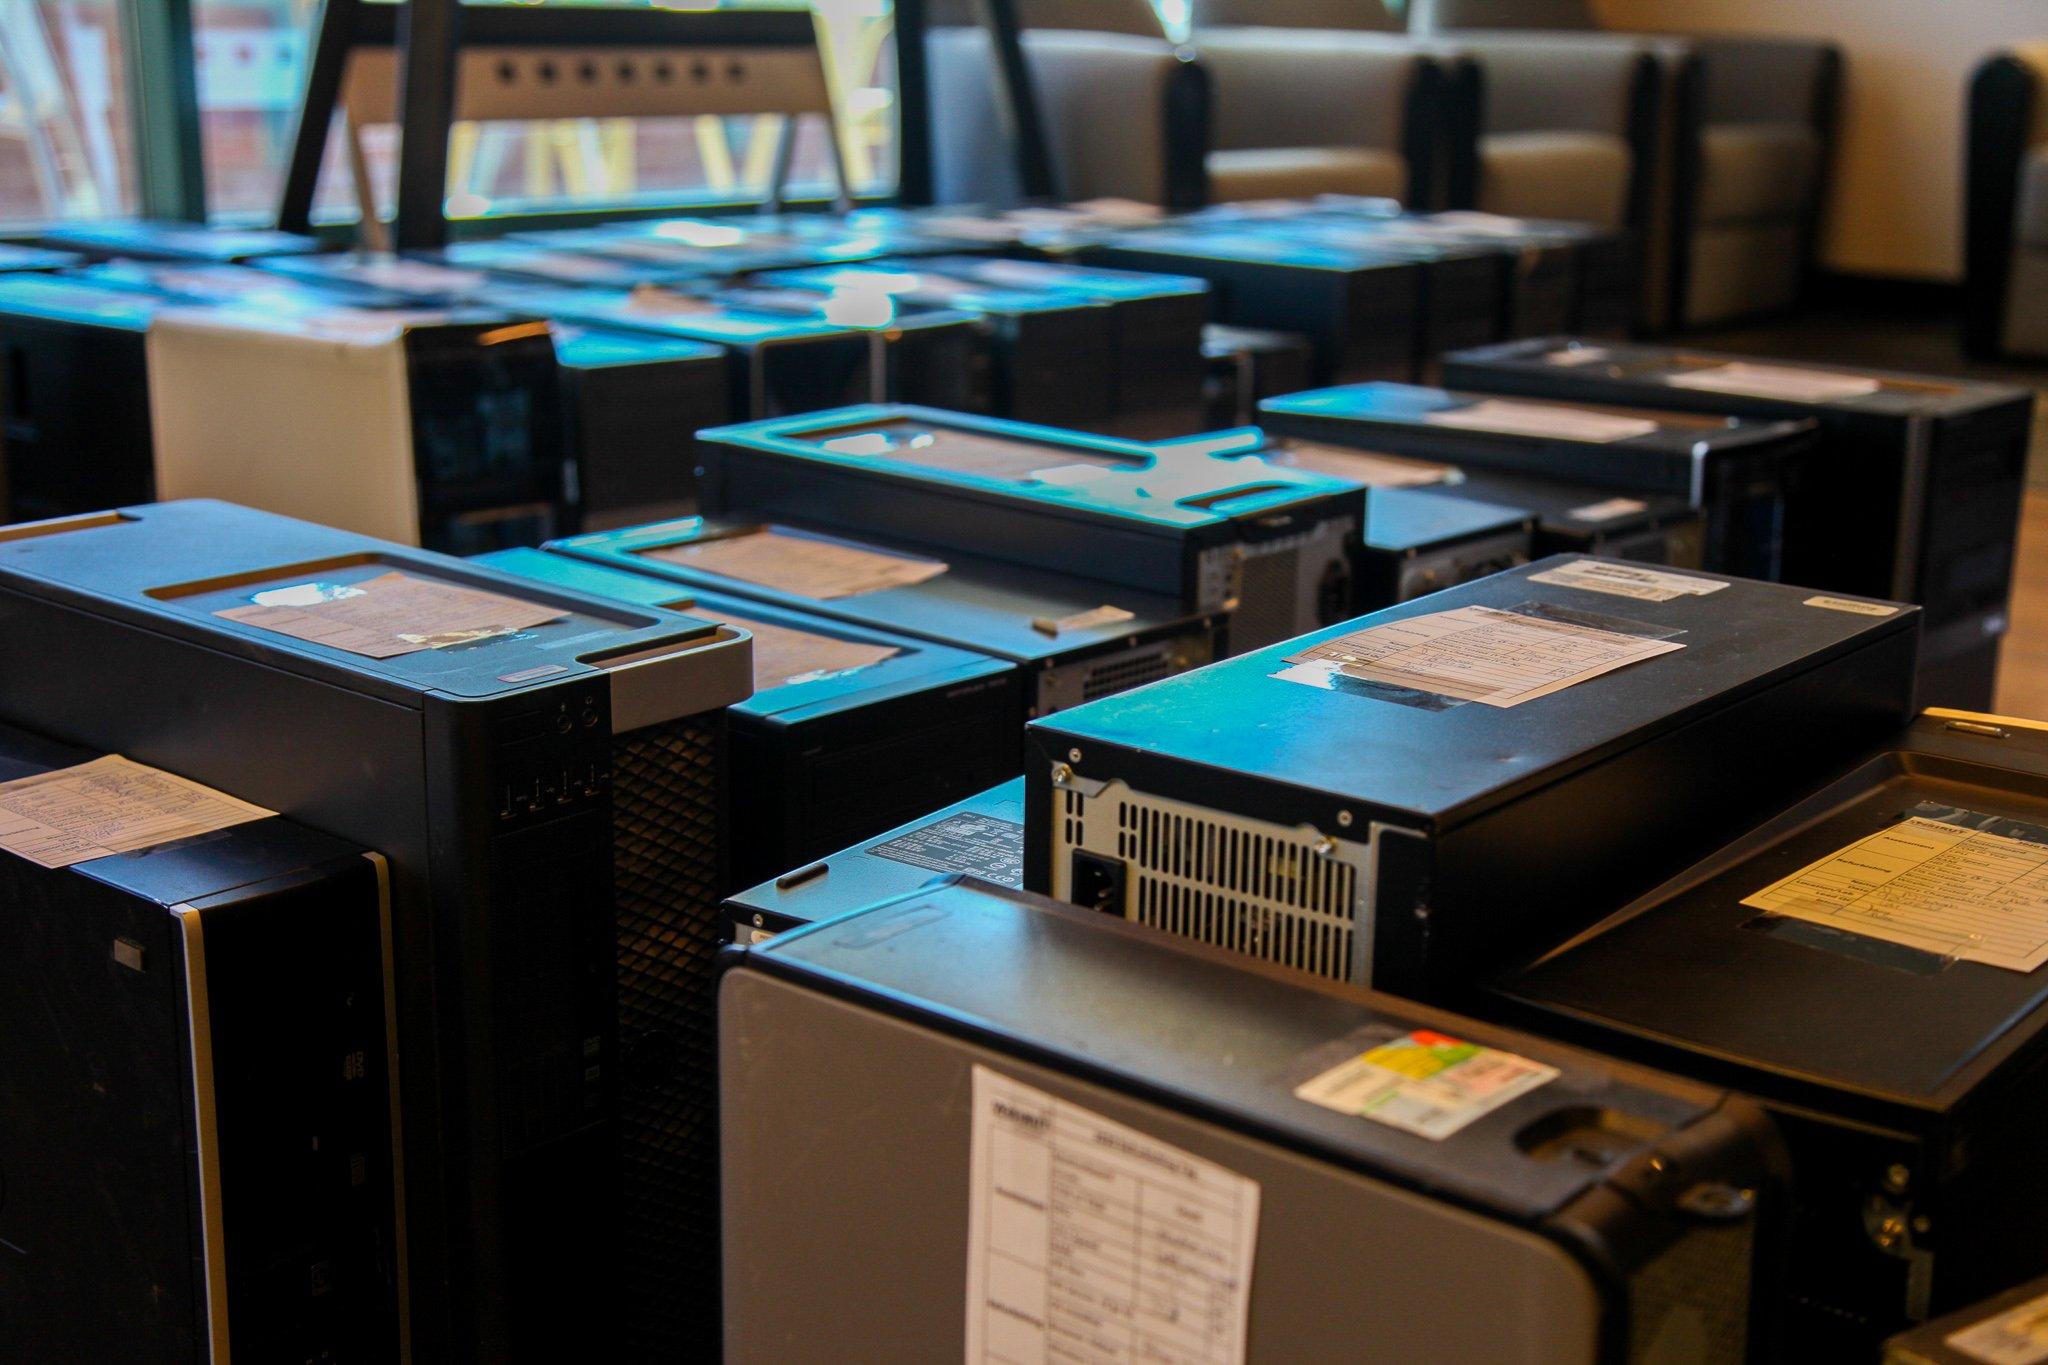 121 computers were refurbished for AZ StRUT.